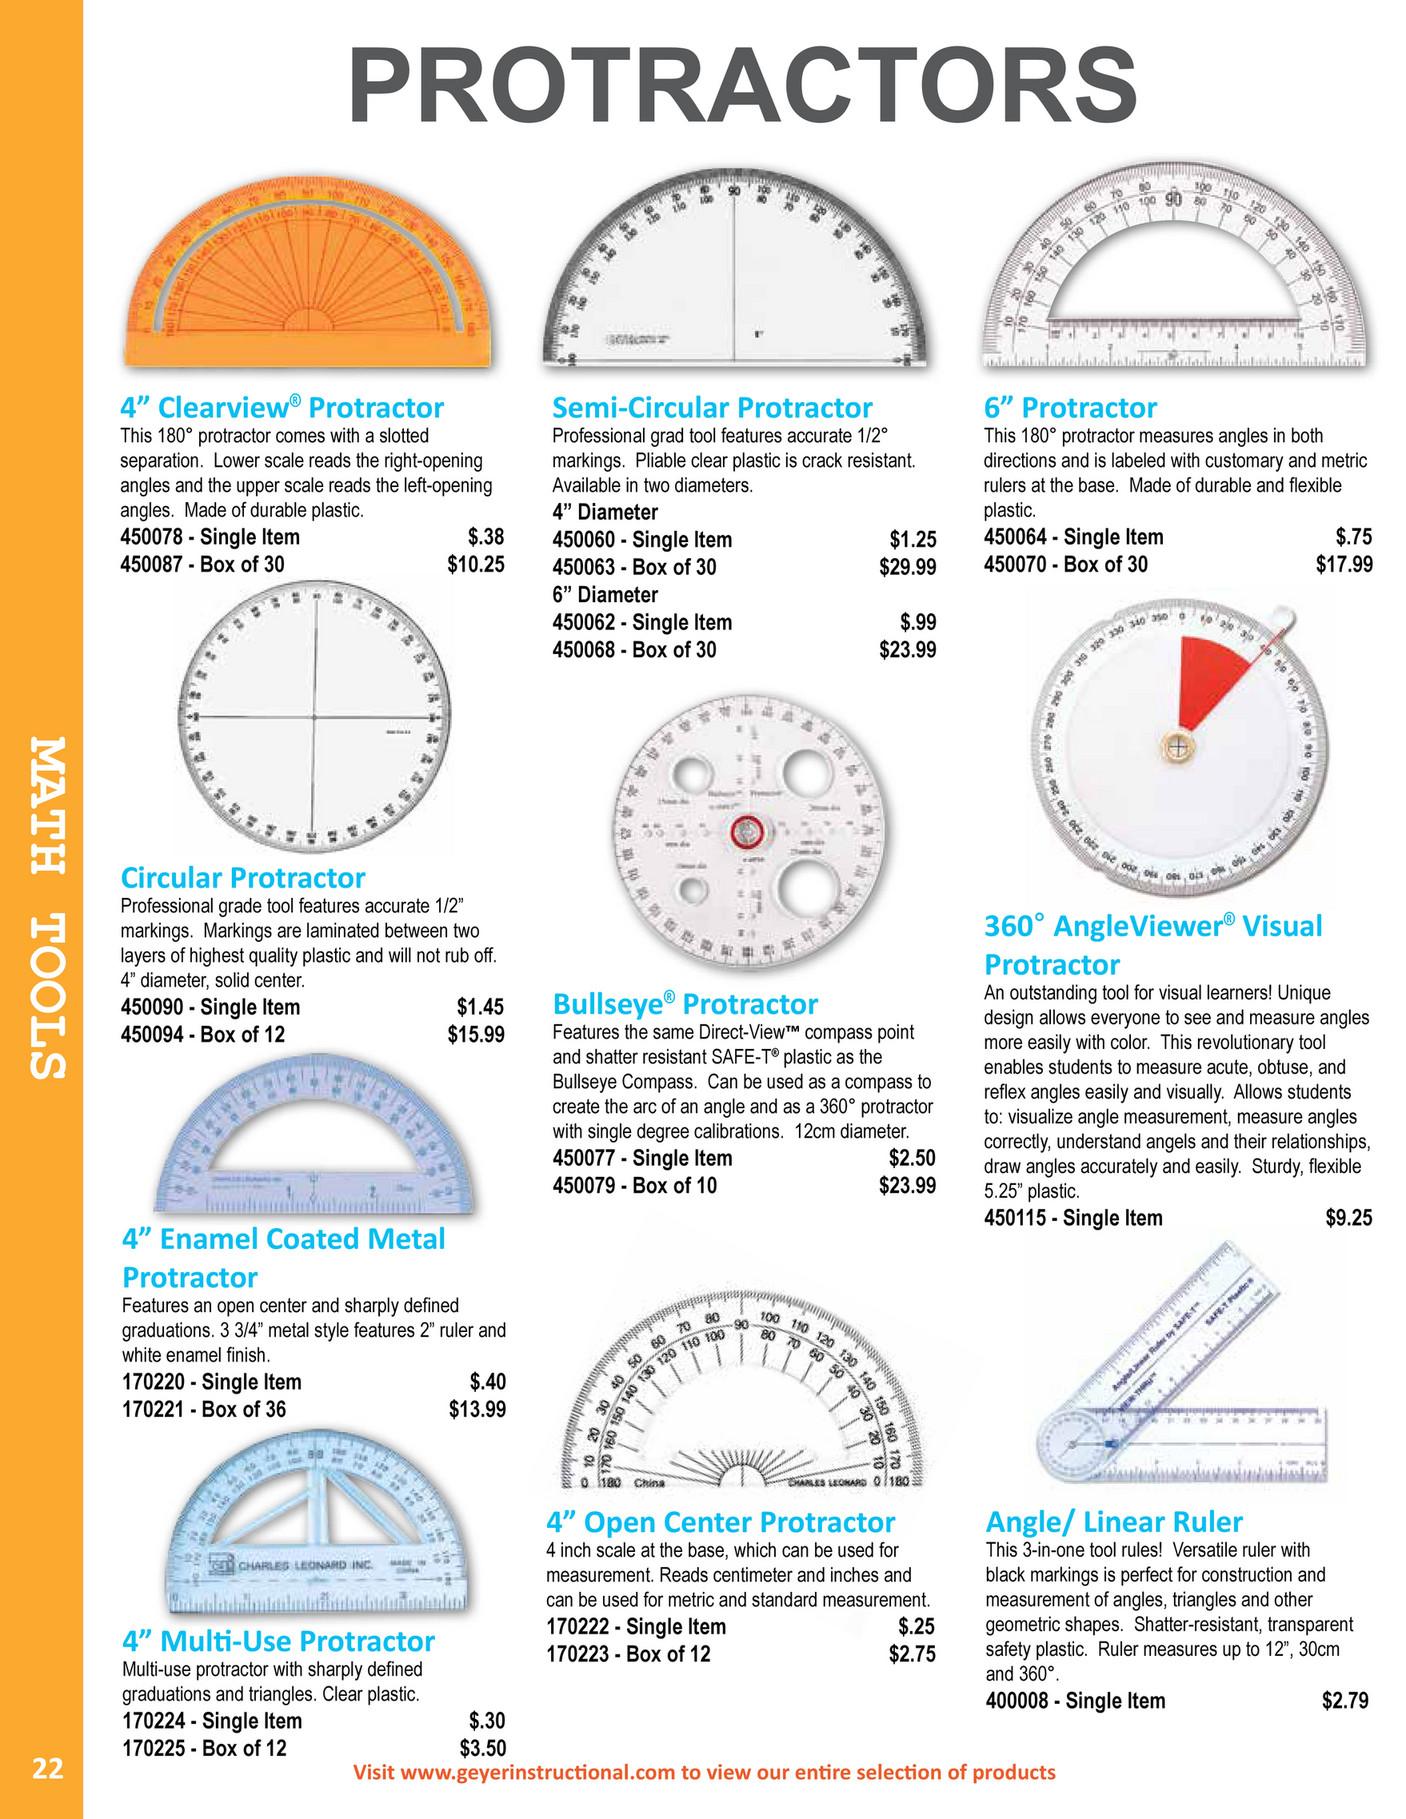 Tool To Measure Angles